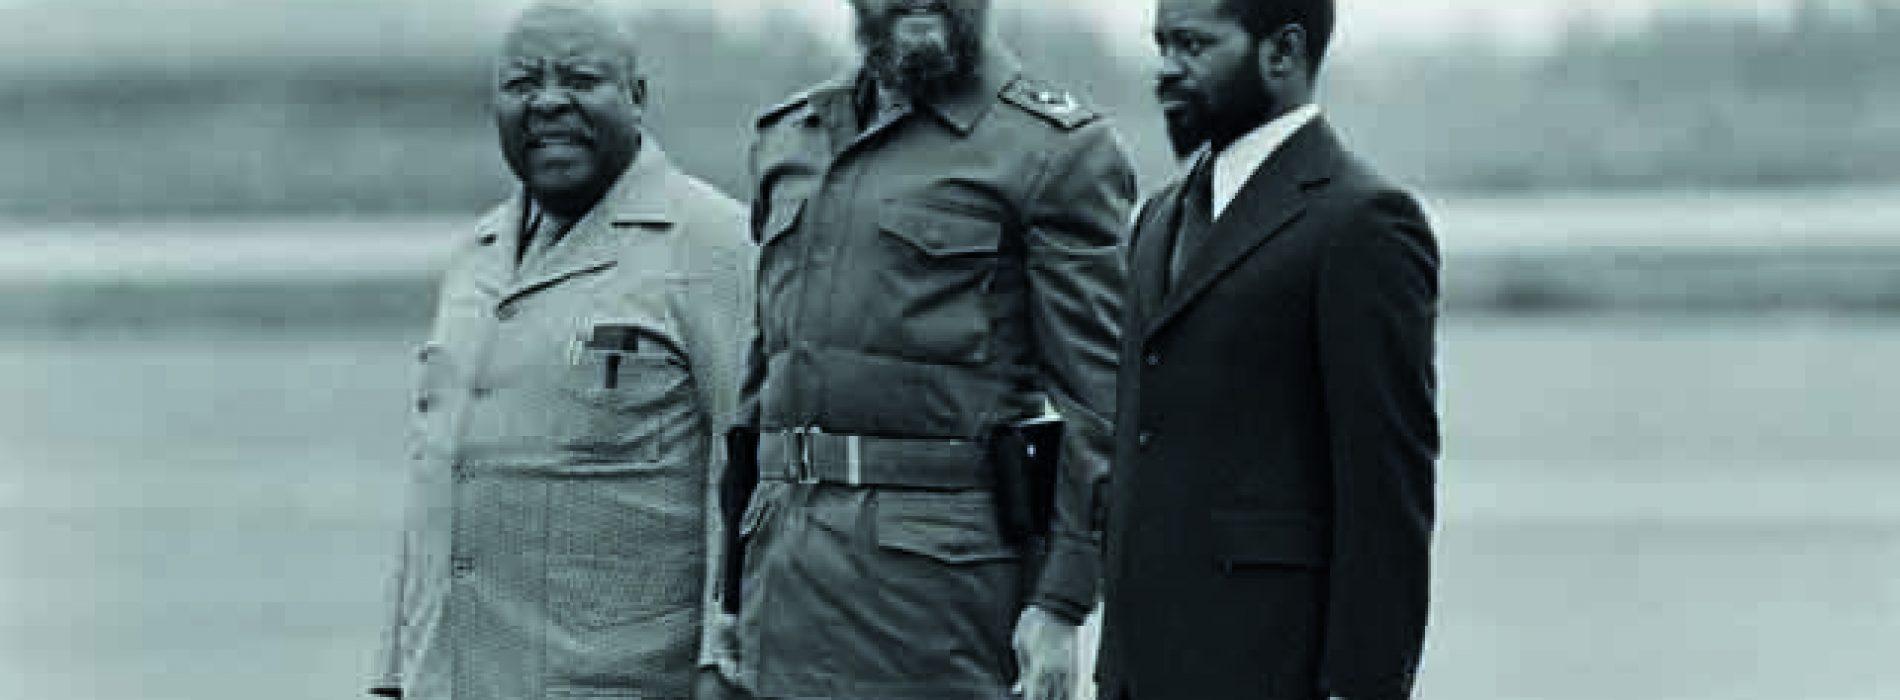 Cuba, Lesotho: 40 years of fruitful ties